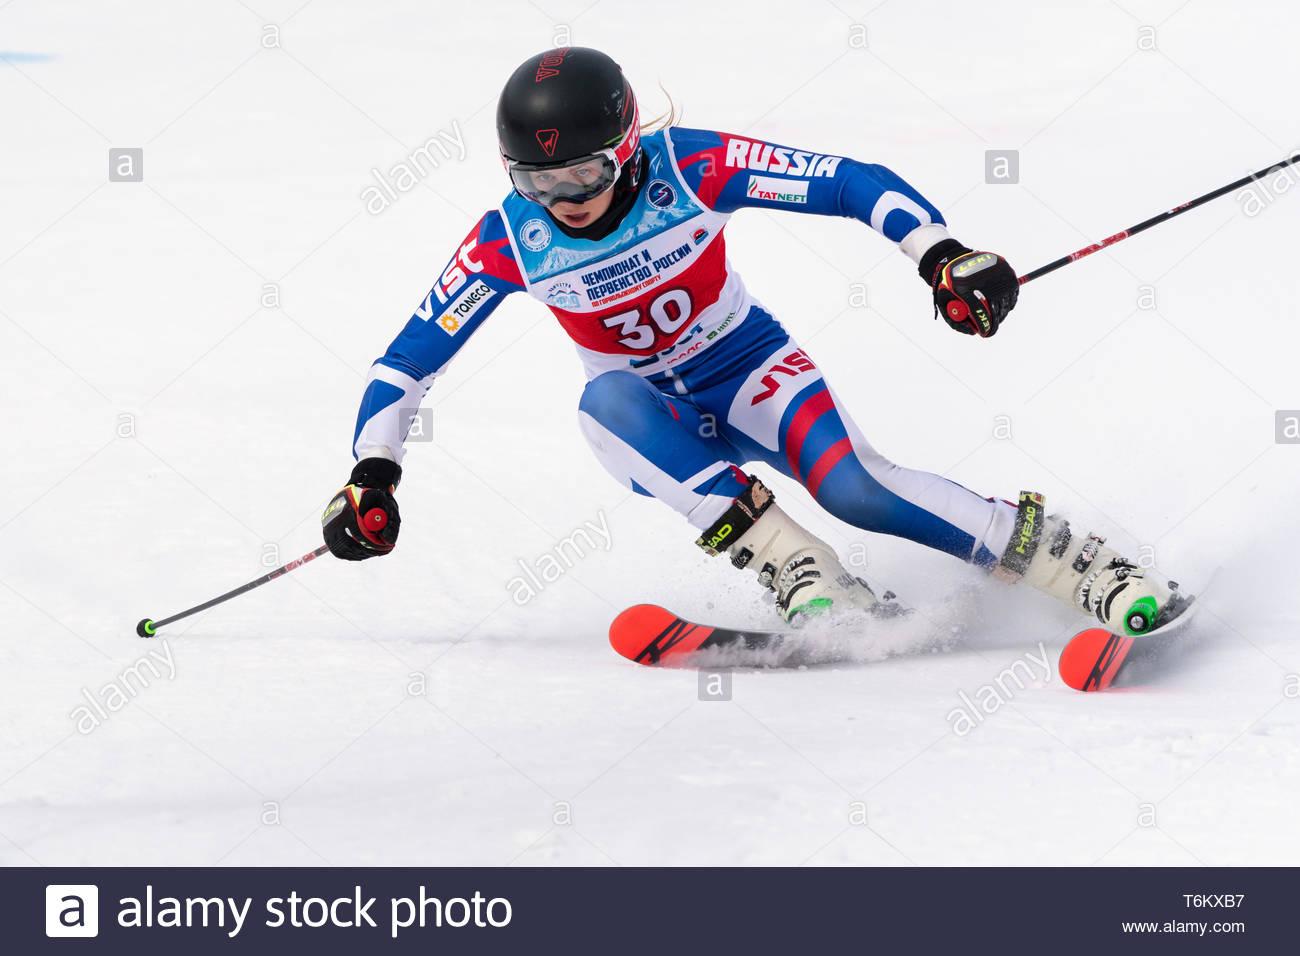 KAMCHATKA, RUSSIA - APR 2, 2019: International Ski Federation Championship, Russian Women's Alpine Skiing Cup, giant slalom. Mountain skier Ulyana Len - Stock Image